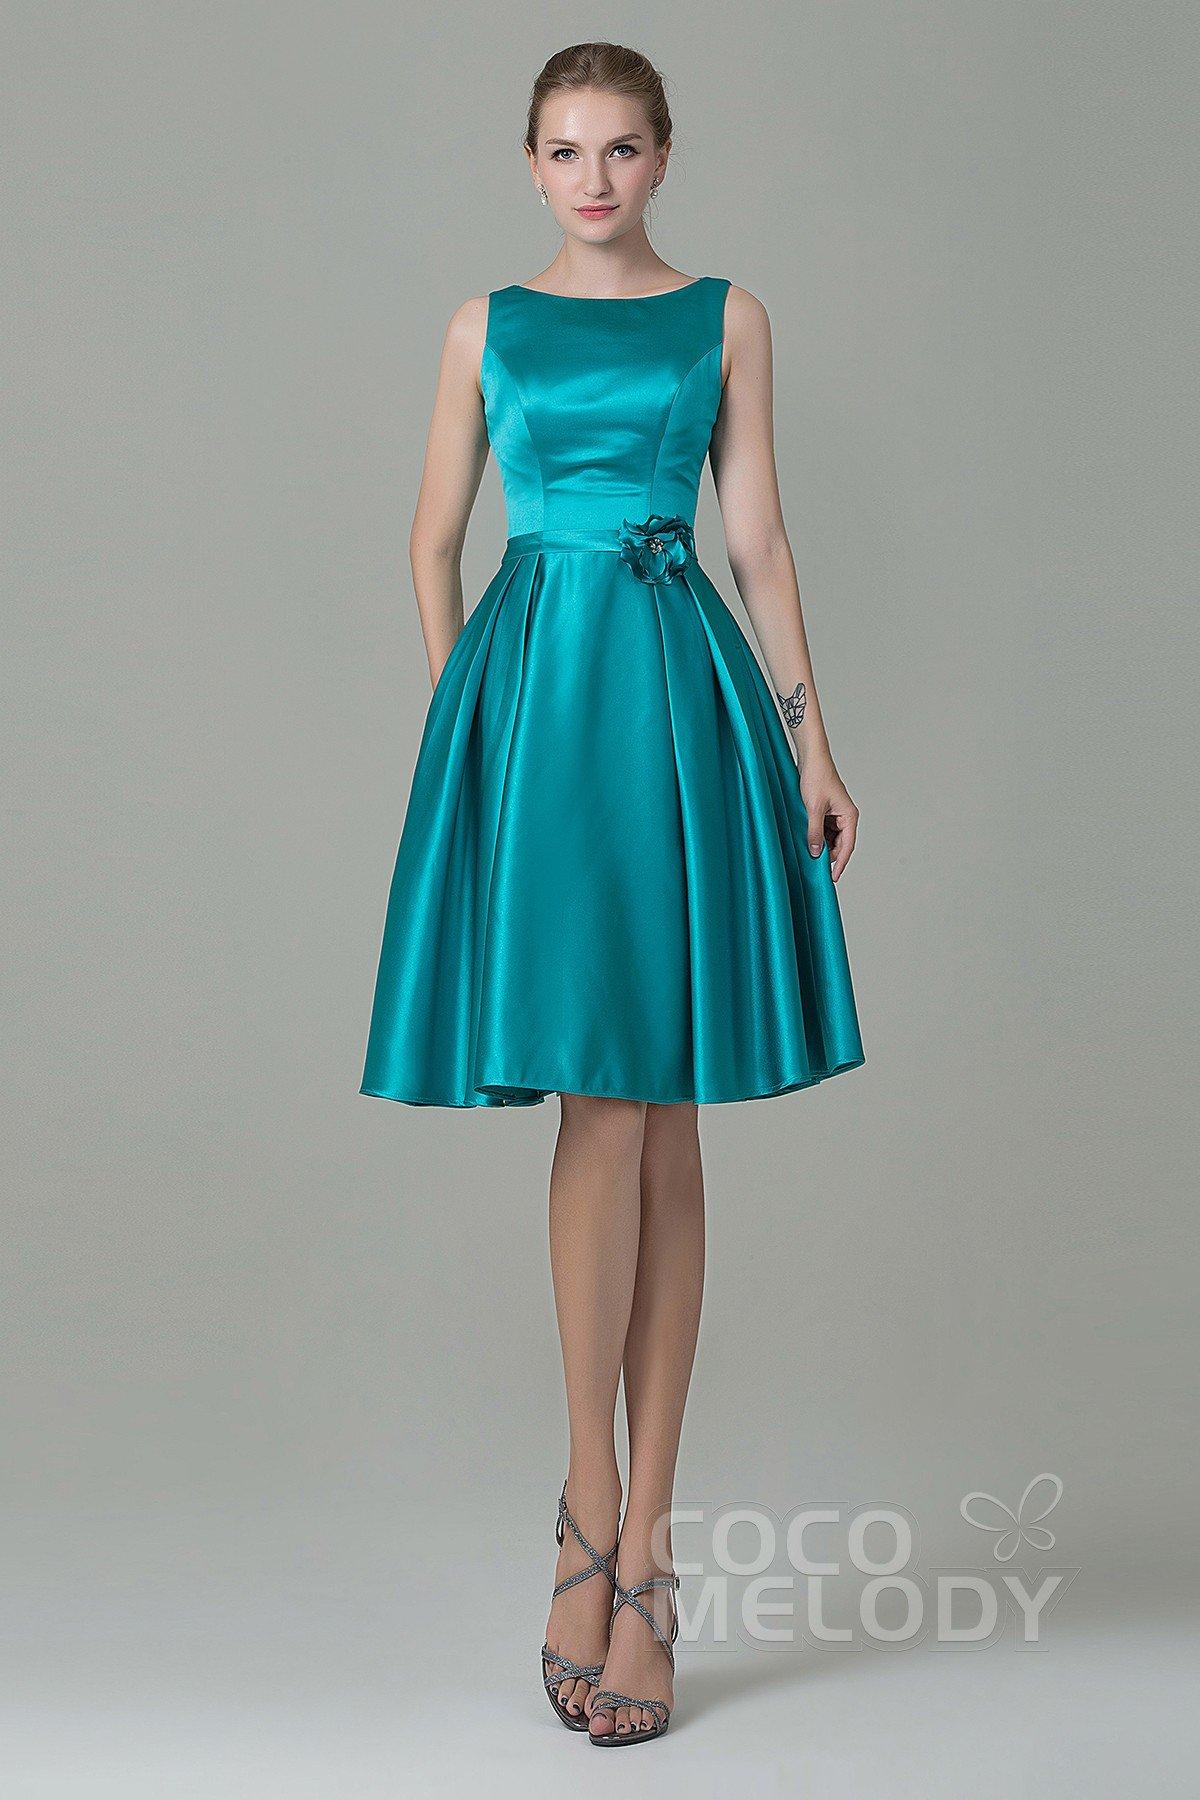 Pretty A Line Bateau Natural Knee Length Satin Sleeveless Zipper Bridesmaid Dress With Flower Cozk1500b